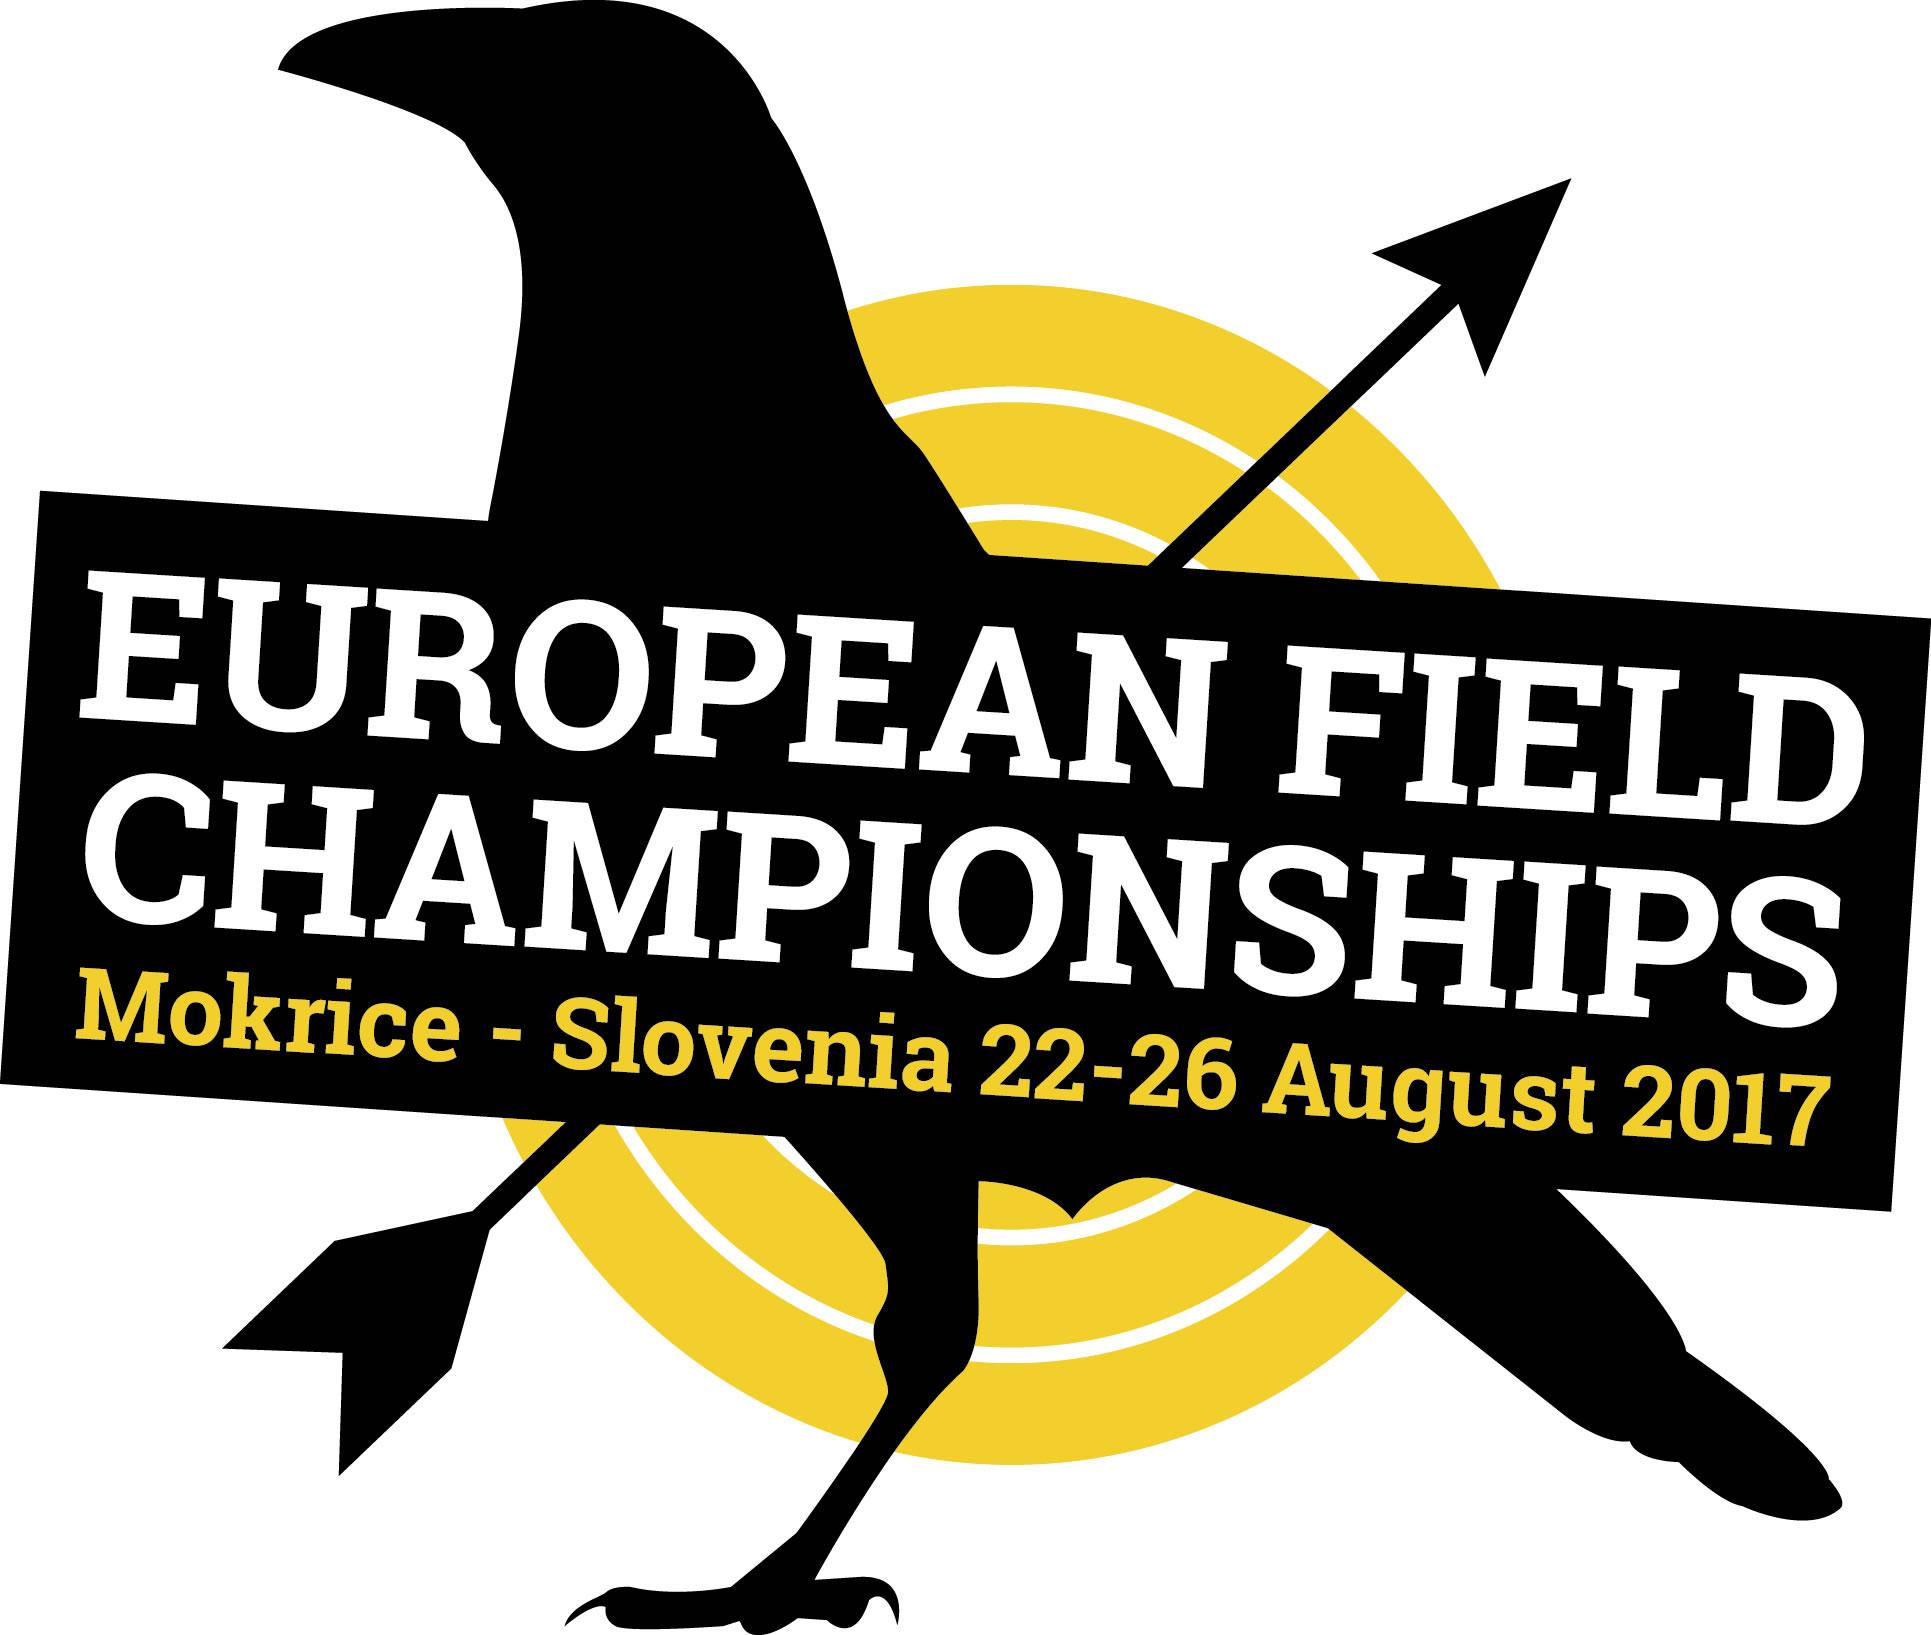 Campionati Europei Campagna